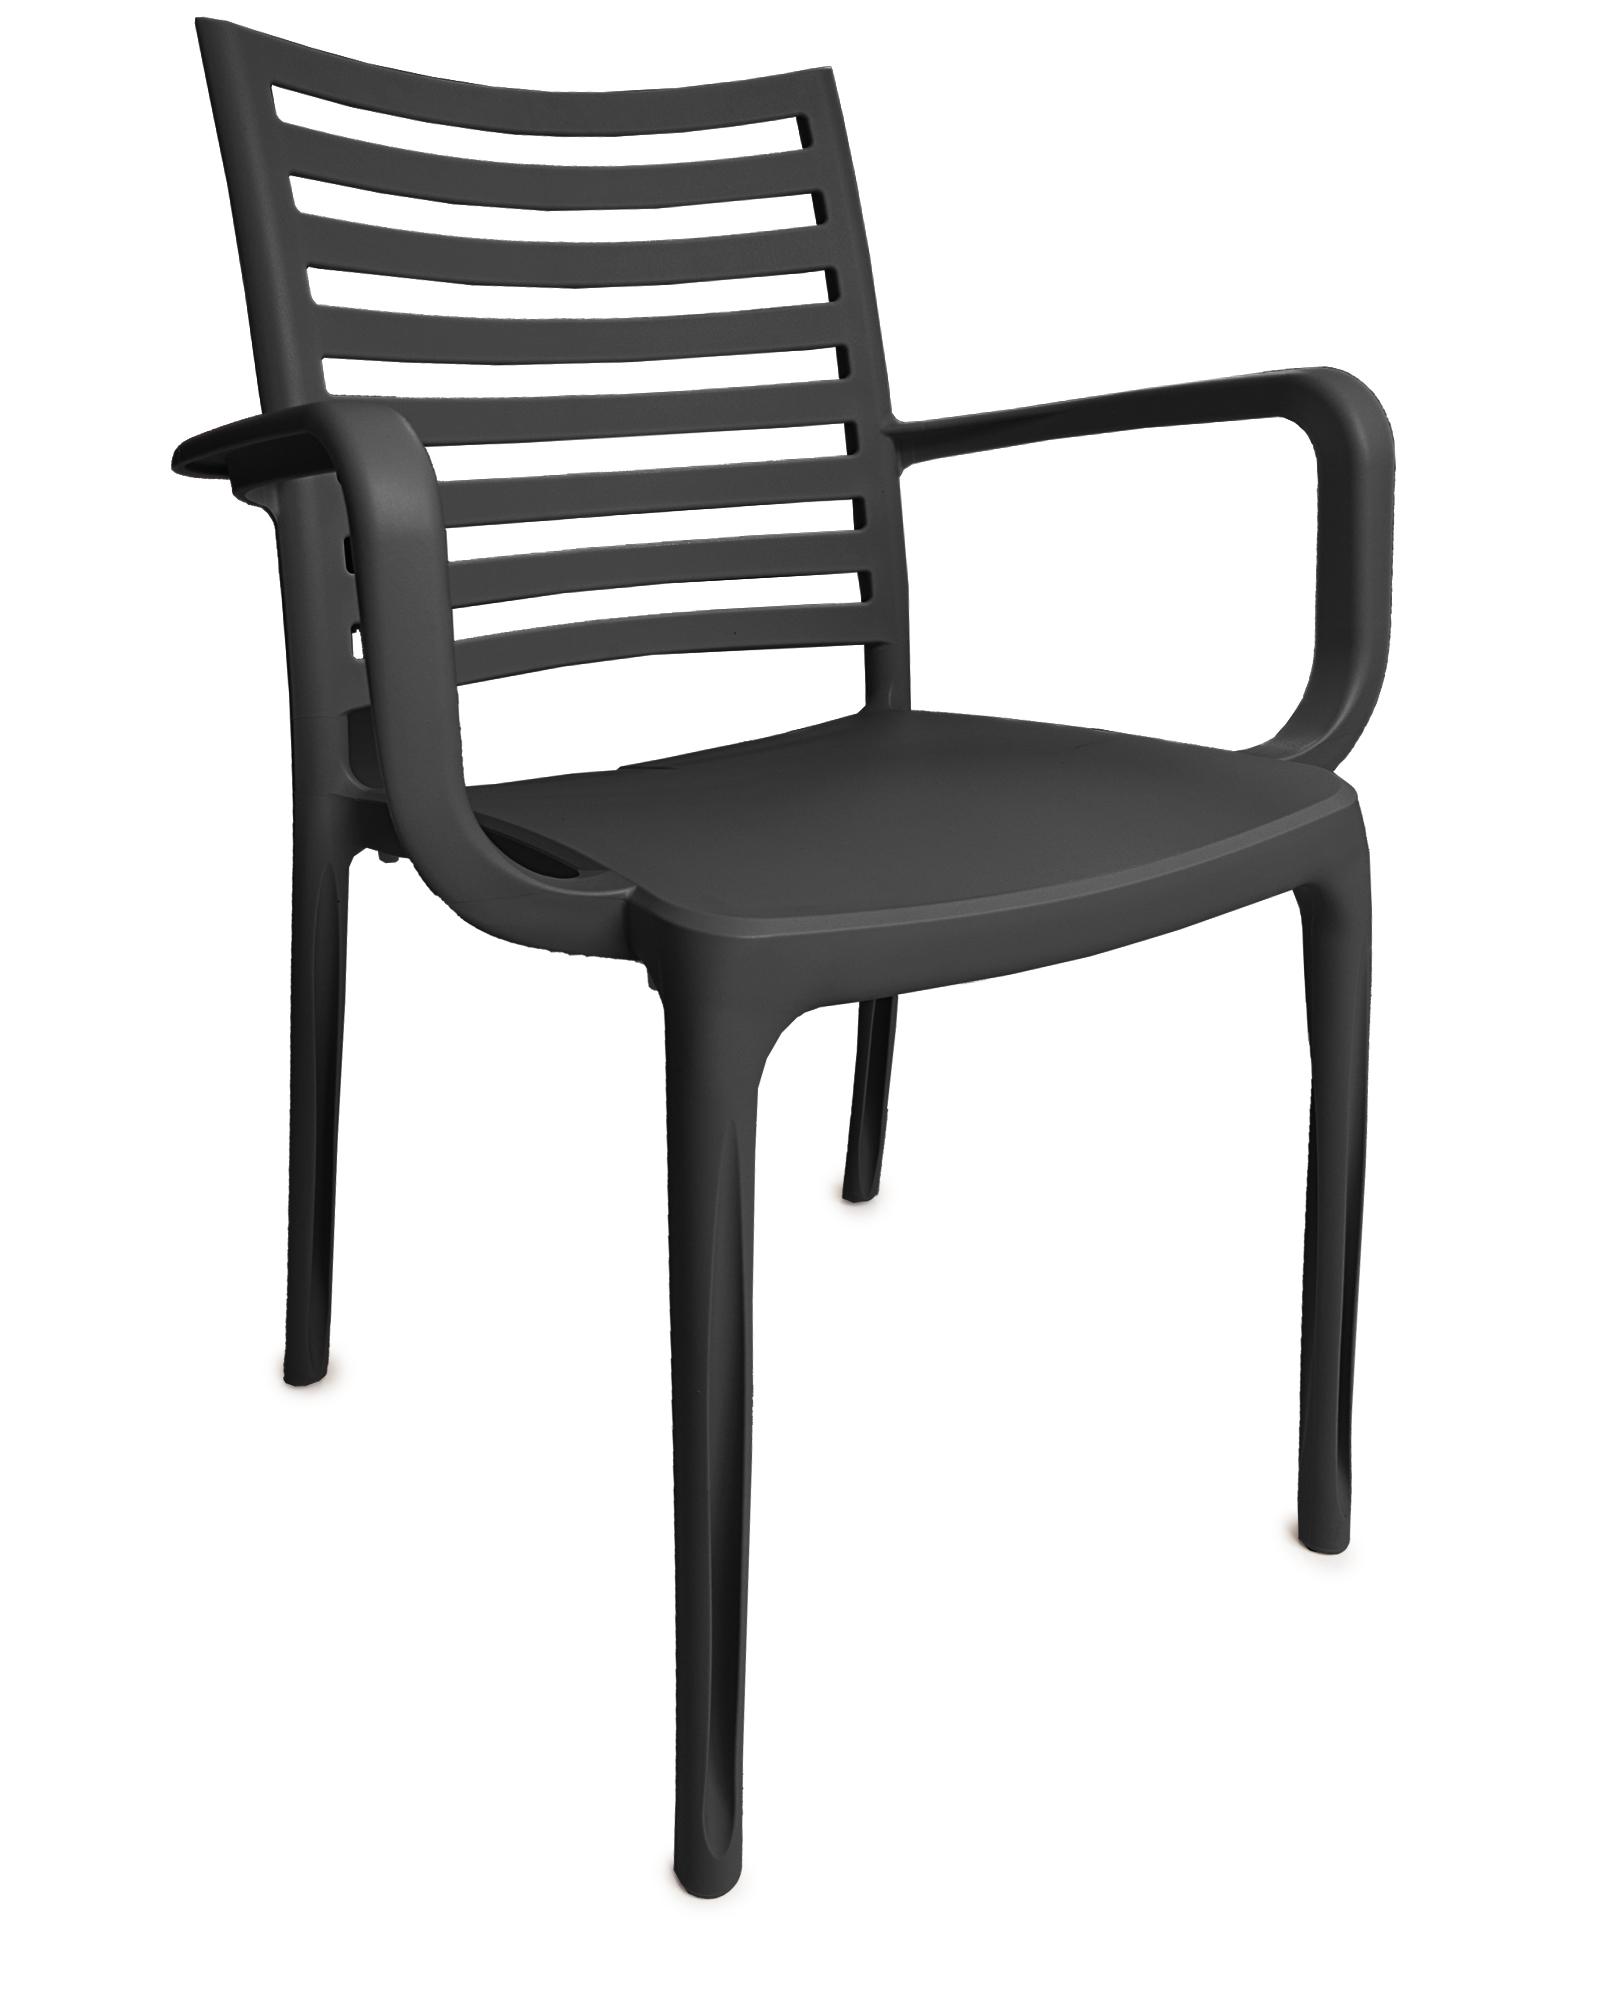 Ondis24 Gartensessel Klappsessel Fidji Kunststoff bequeme Sitzfläche stapelbar